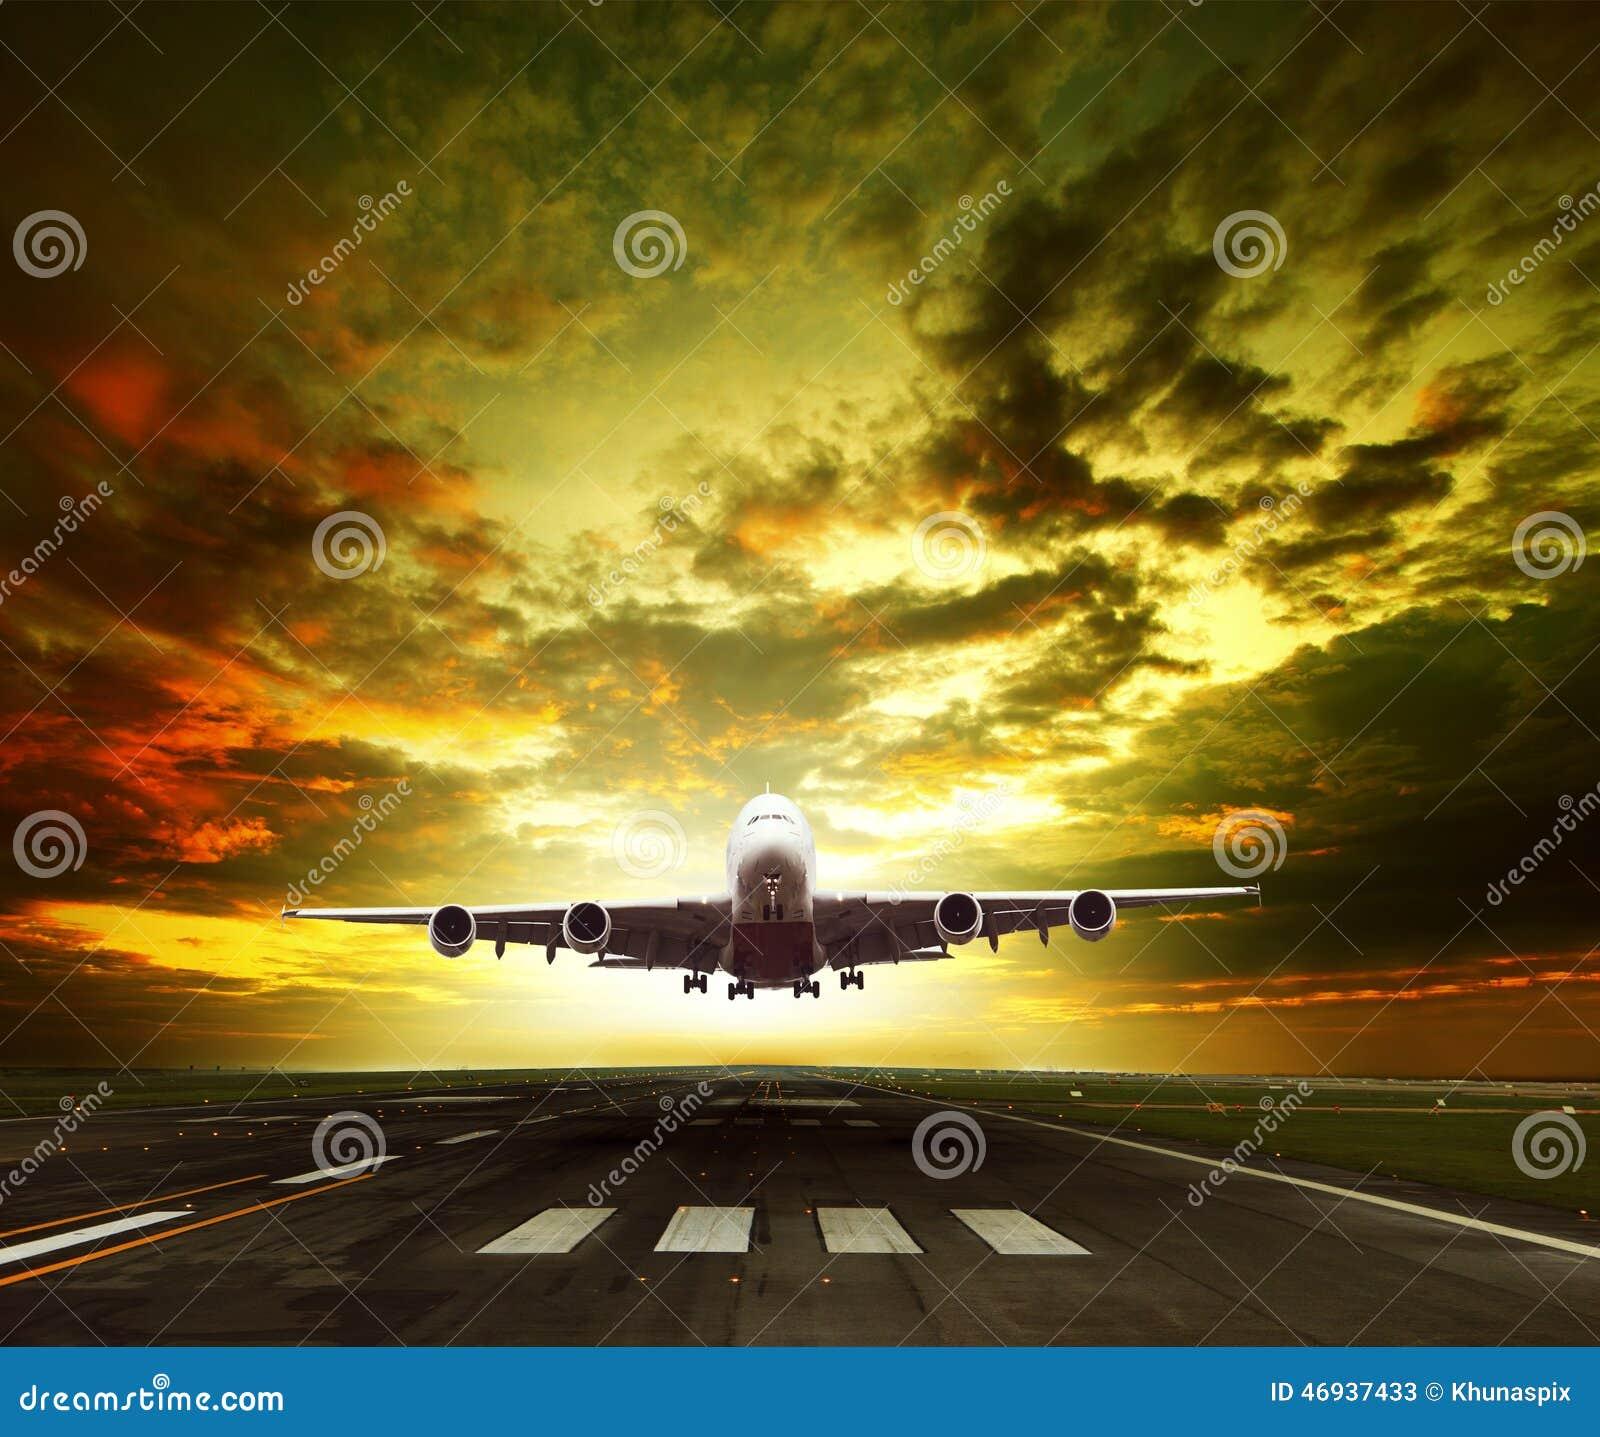 passenger transport business plan